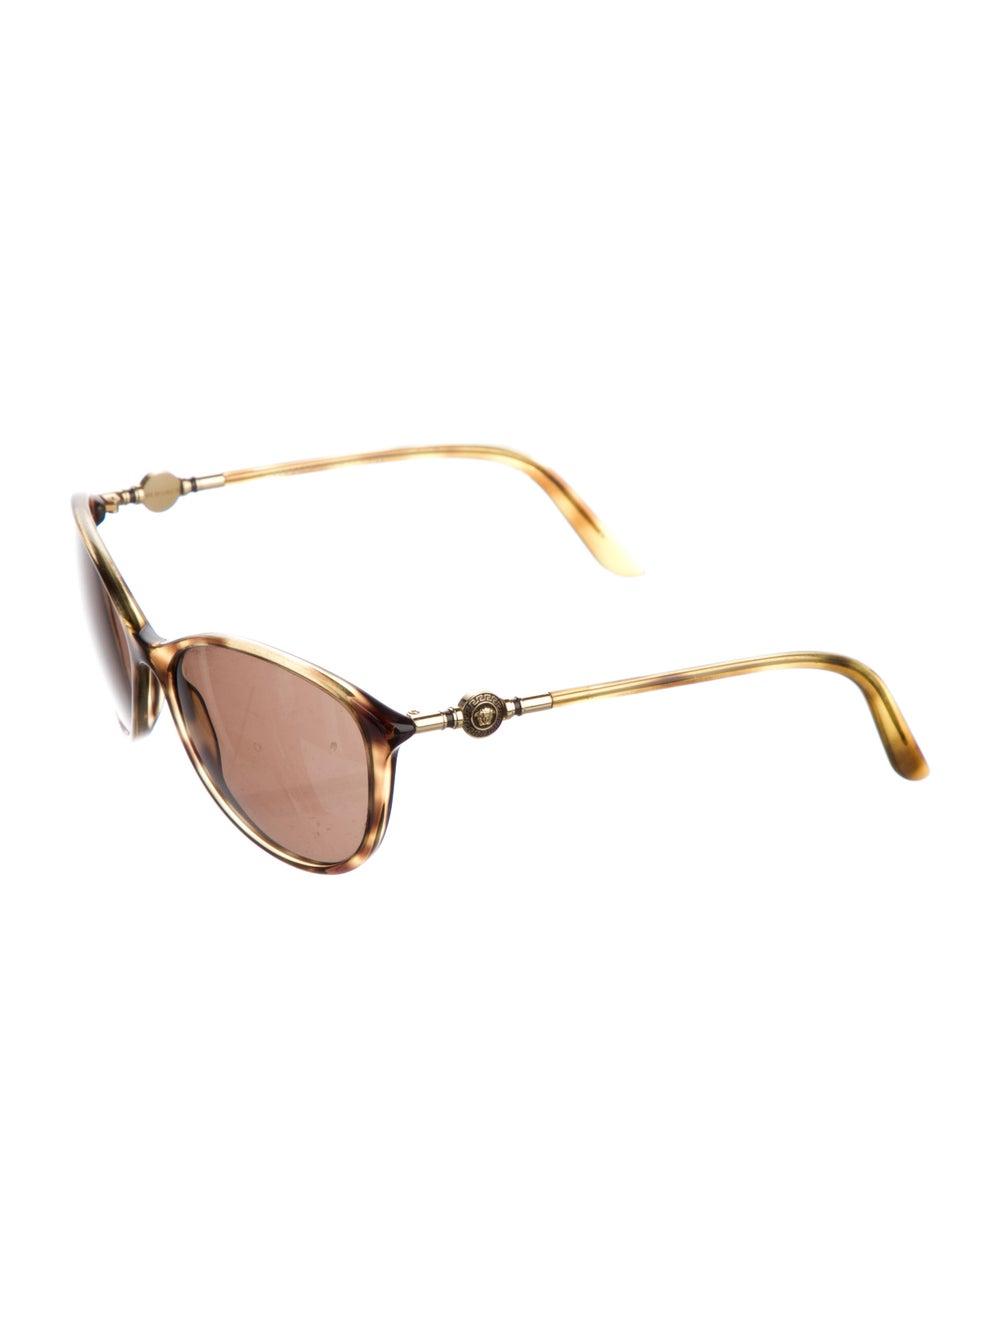 Versace Cat-Eye Tinted Sunglasses Gold - image 2